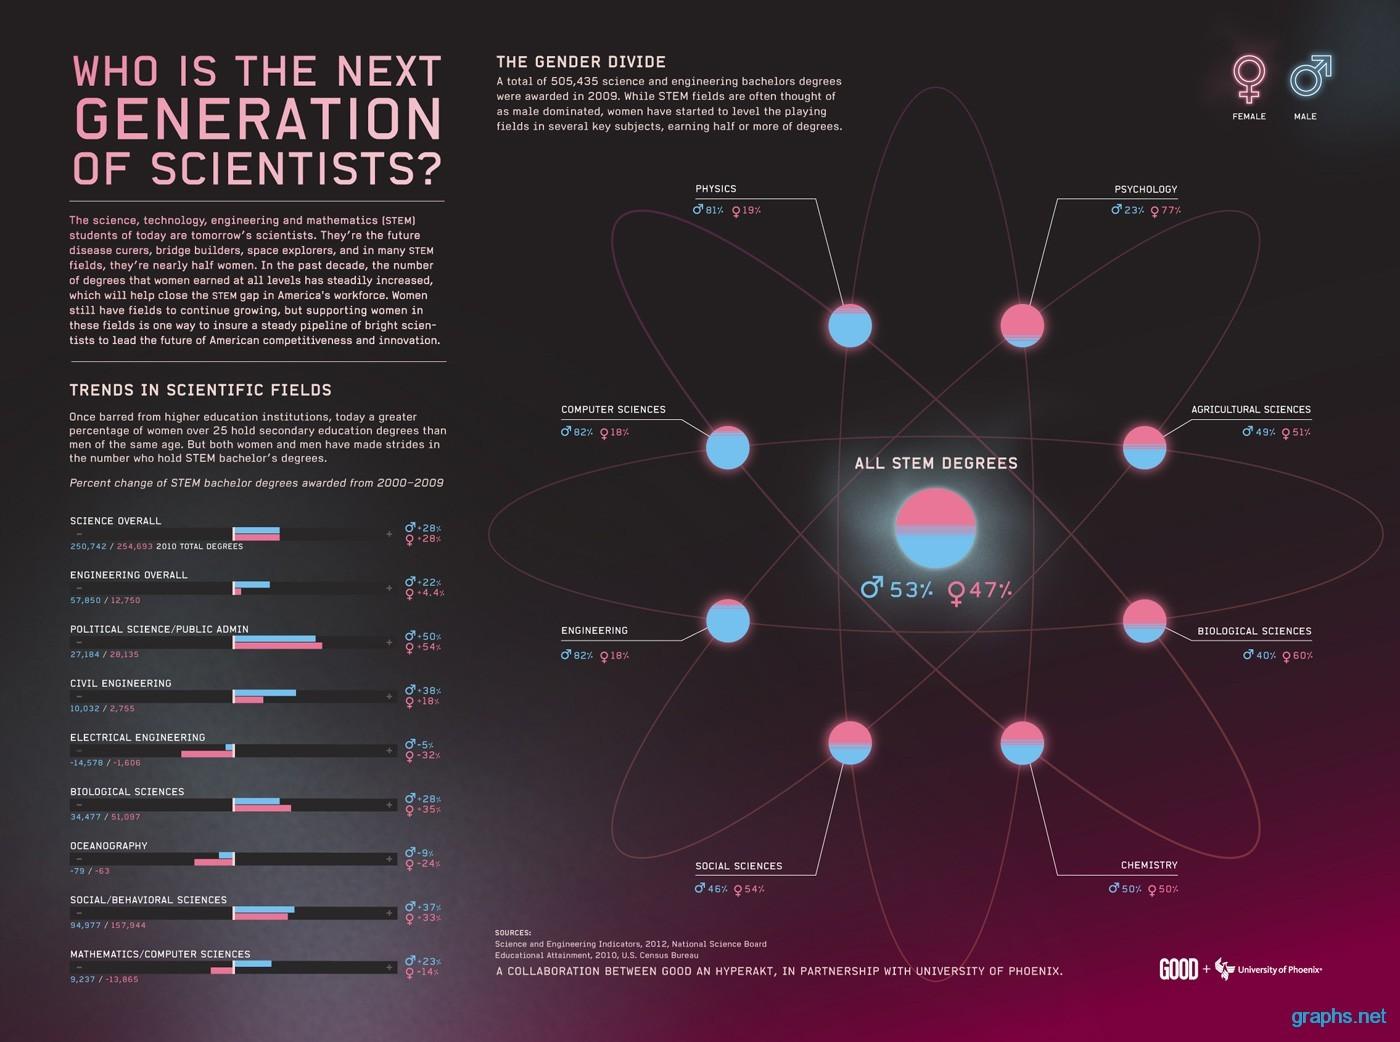 Trends in Scientific Field